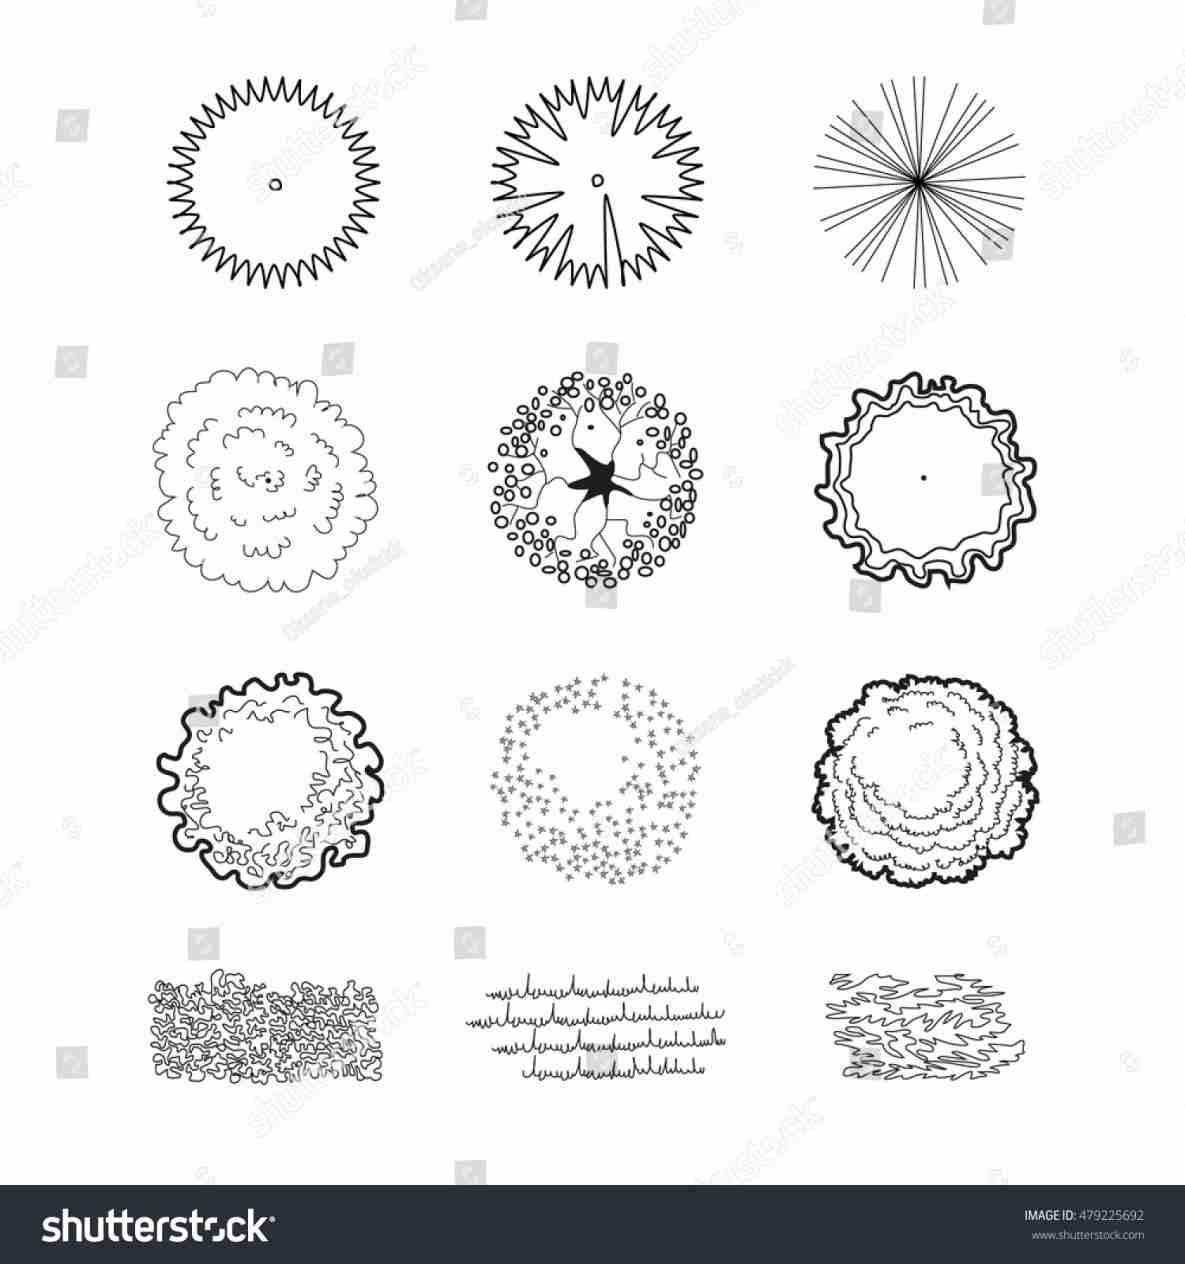 1185x1264 Vector Rhfreeescortpostcom Garden Landscape Design Plant Symbols